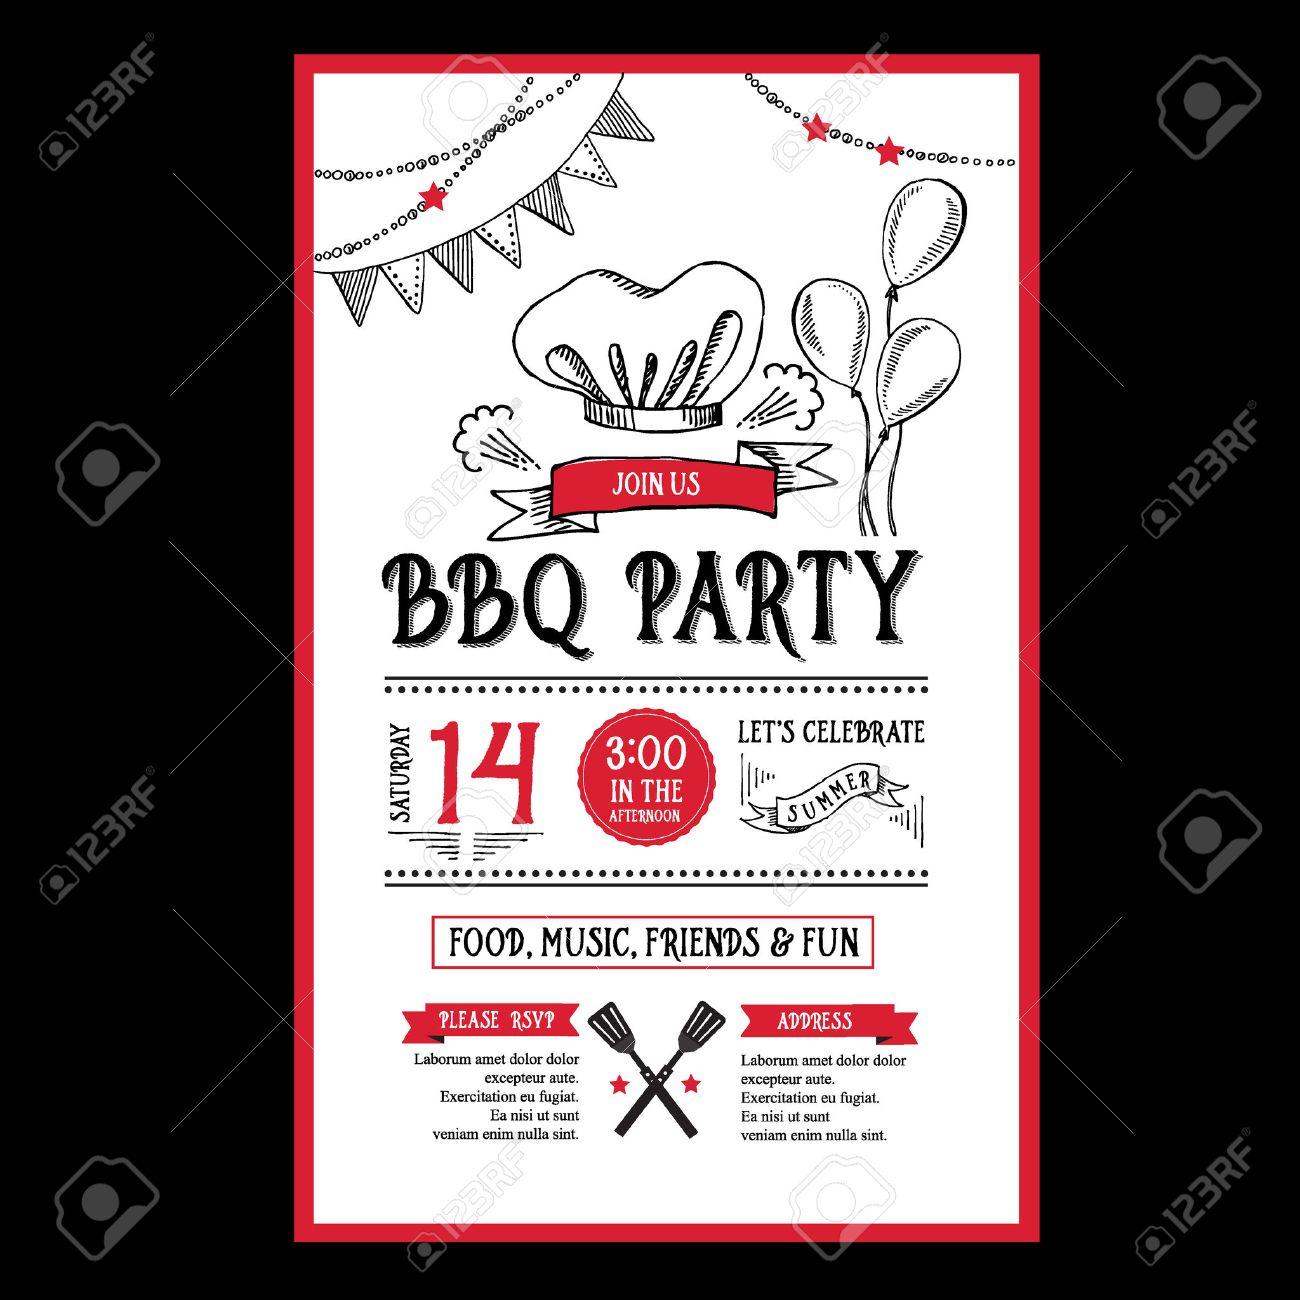 Barbecue party invitation bbq template menu design food flyer stock vector 40115069